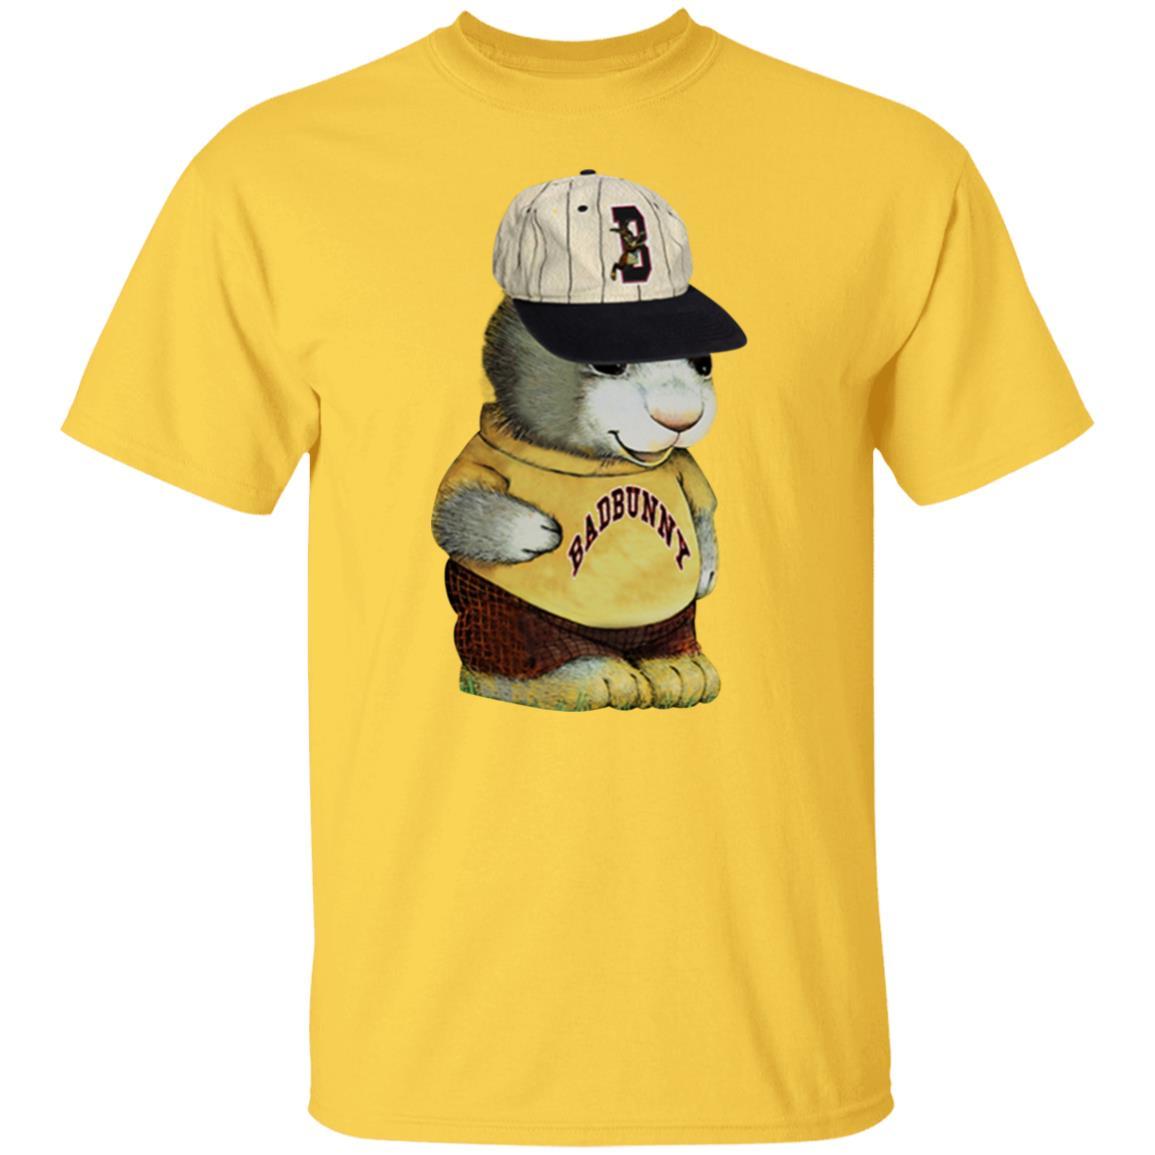 Badbunny Las Que No Iban A Salir Bunny Tee Yellow T Shirt Funny Whiskey Shirt